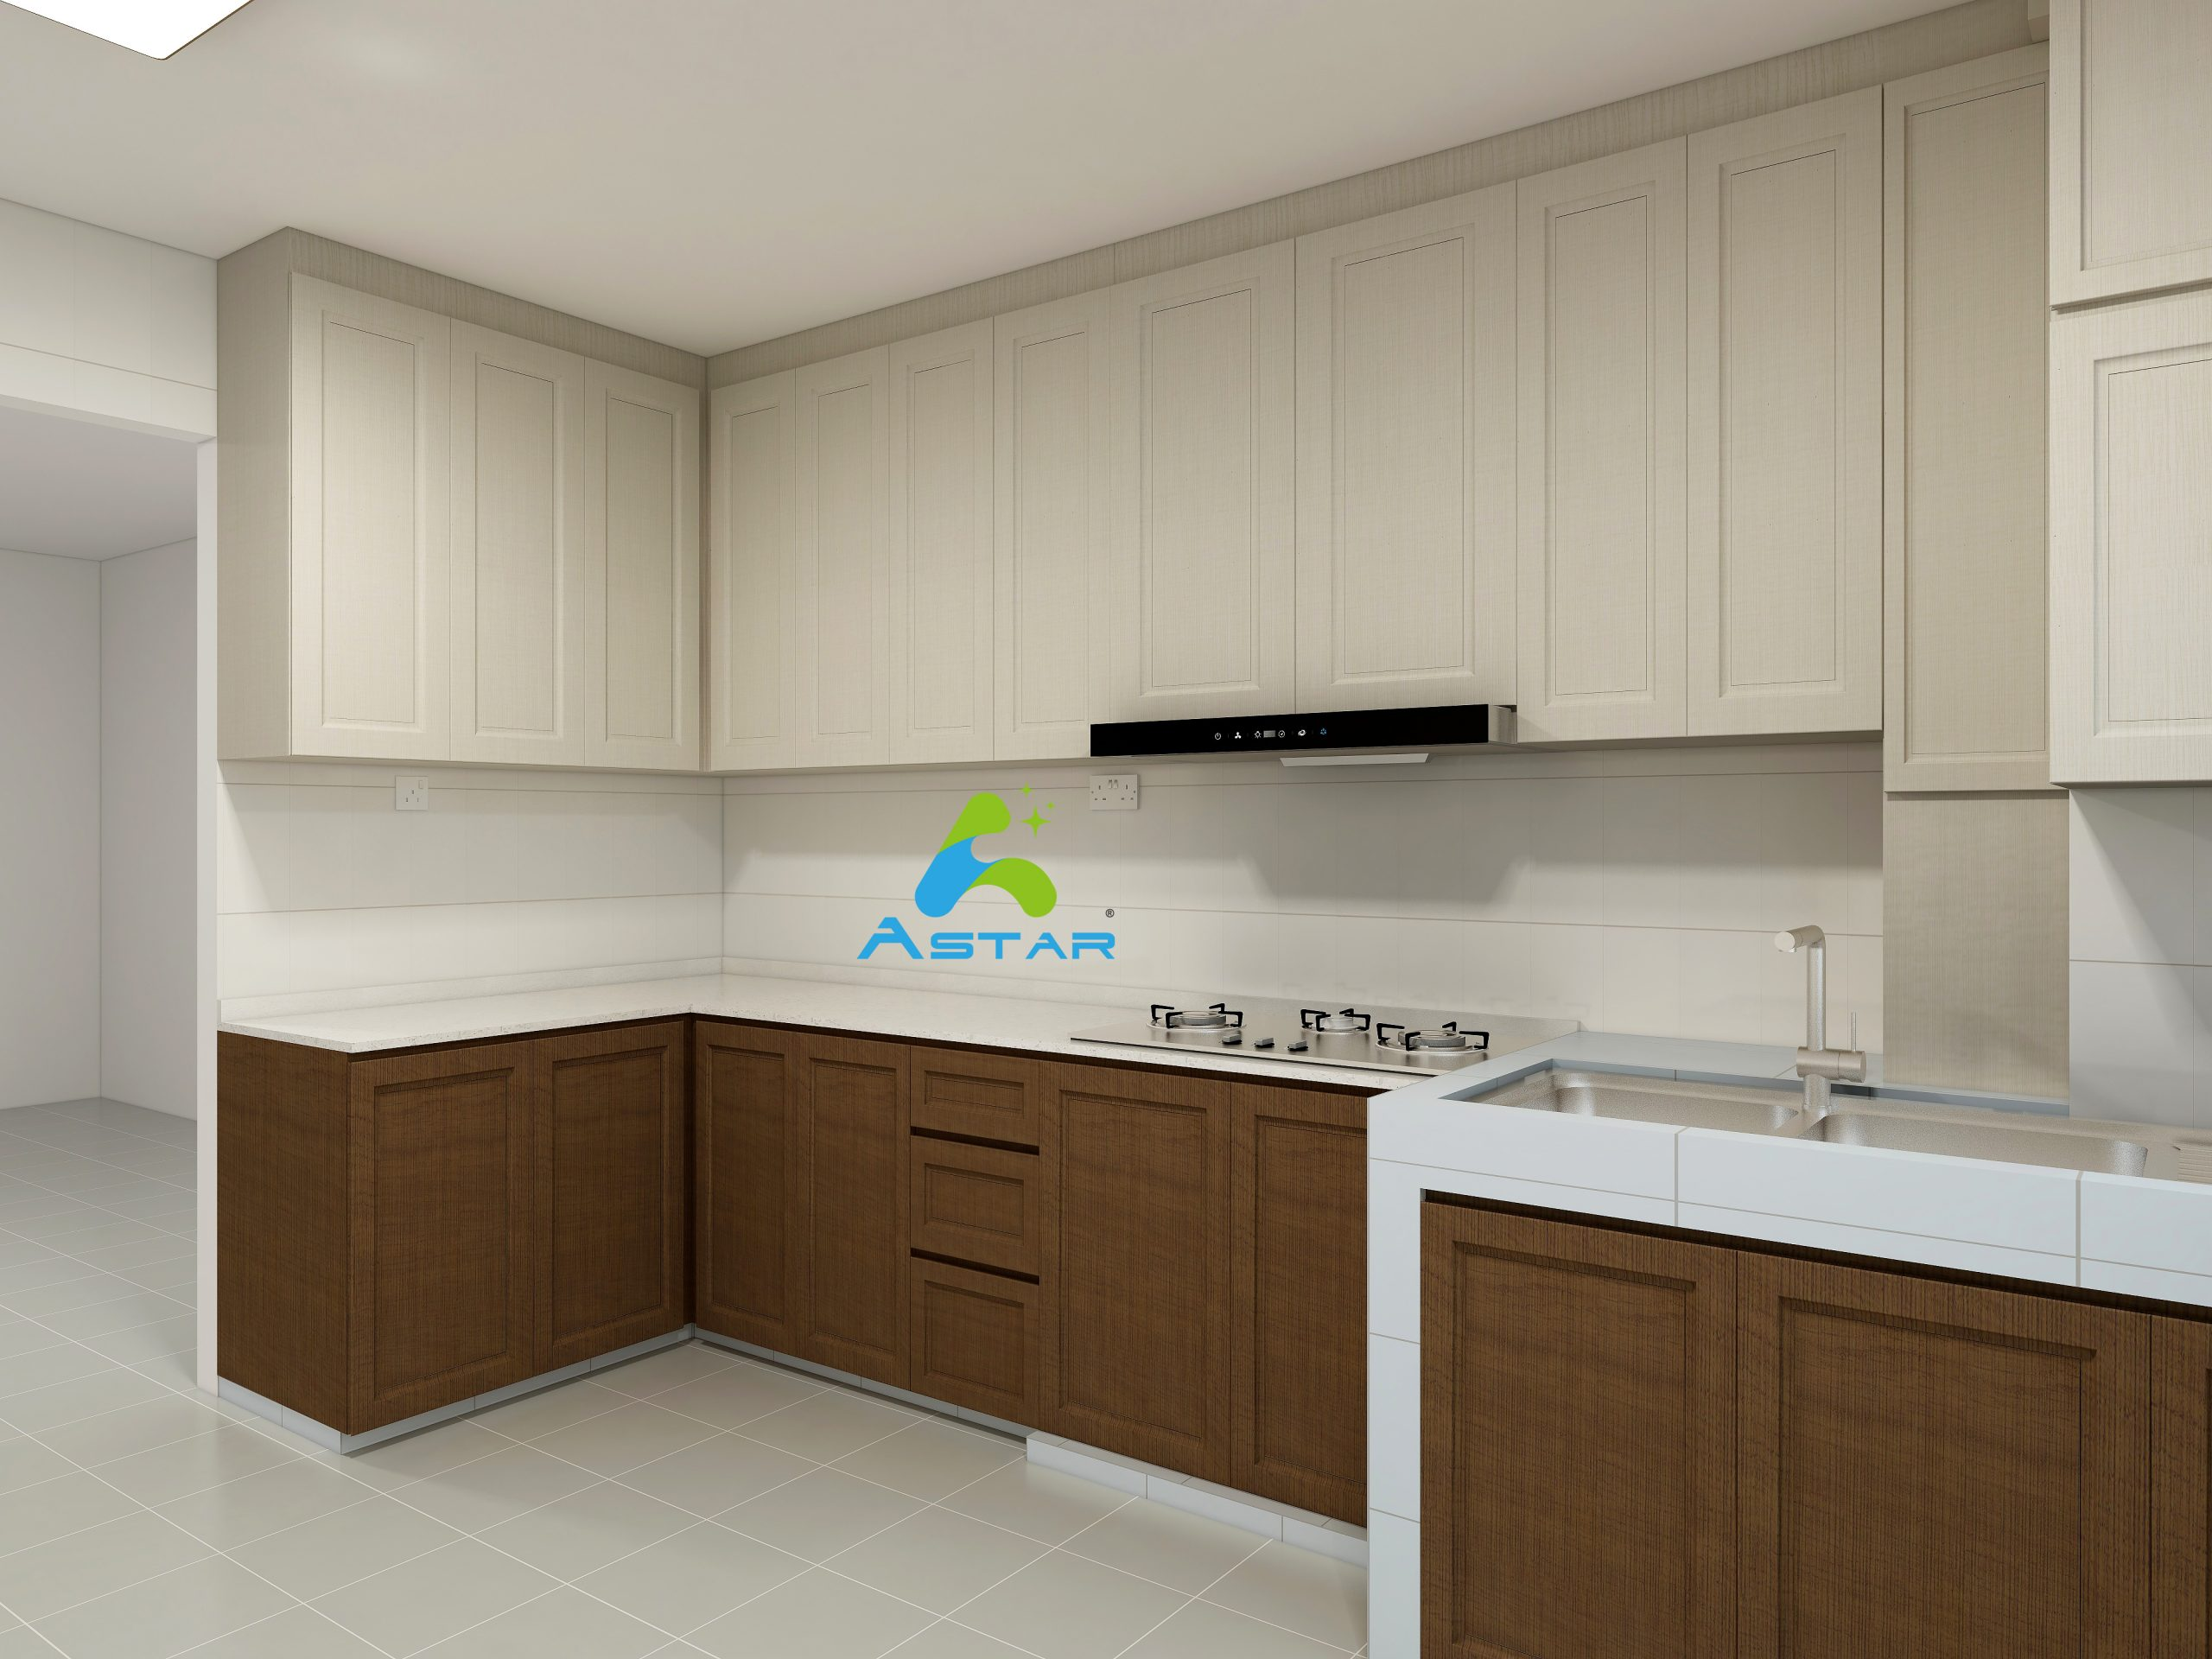 a star furnishing projects Blk 816 Yishun St 81 S 760816 1